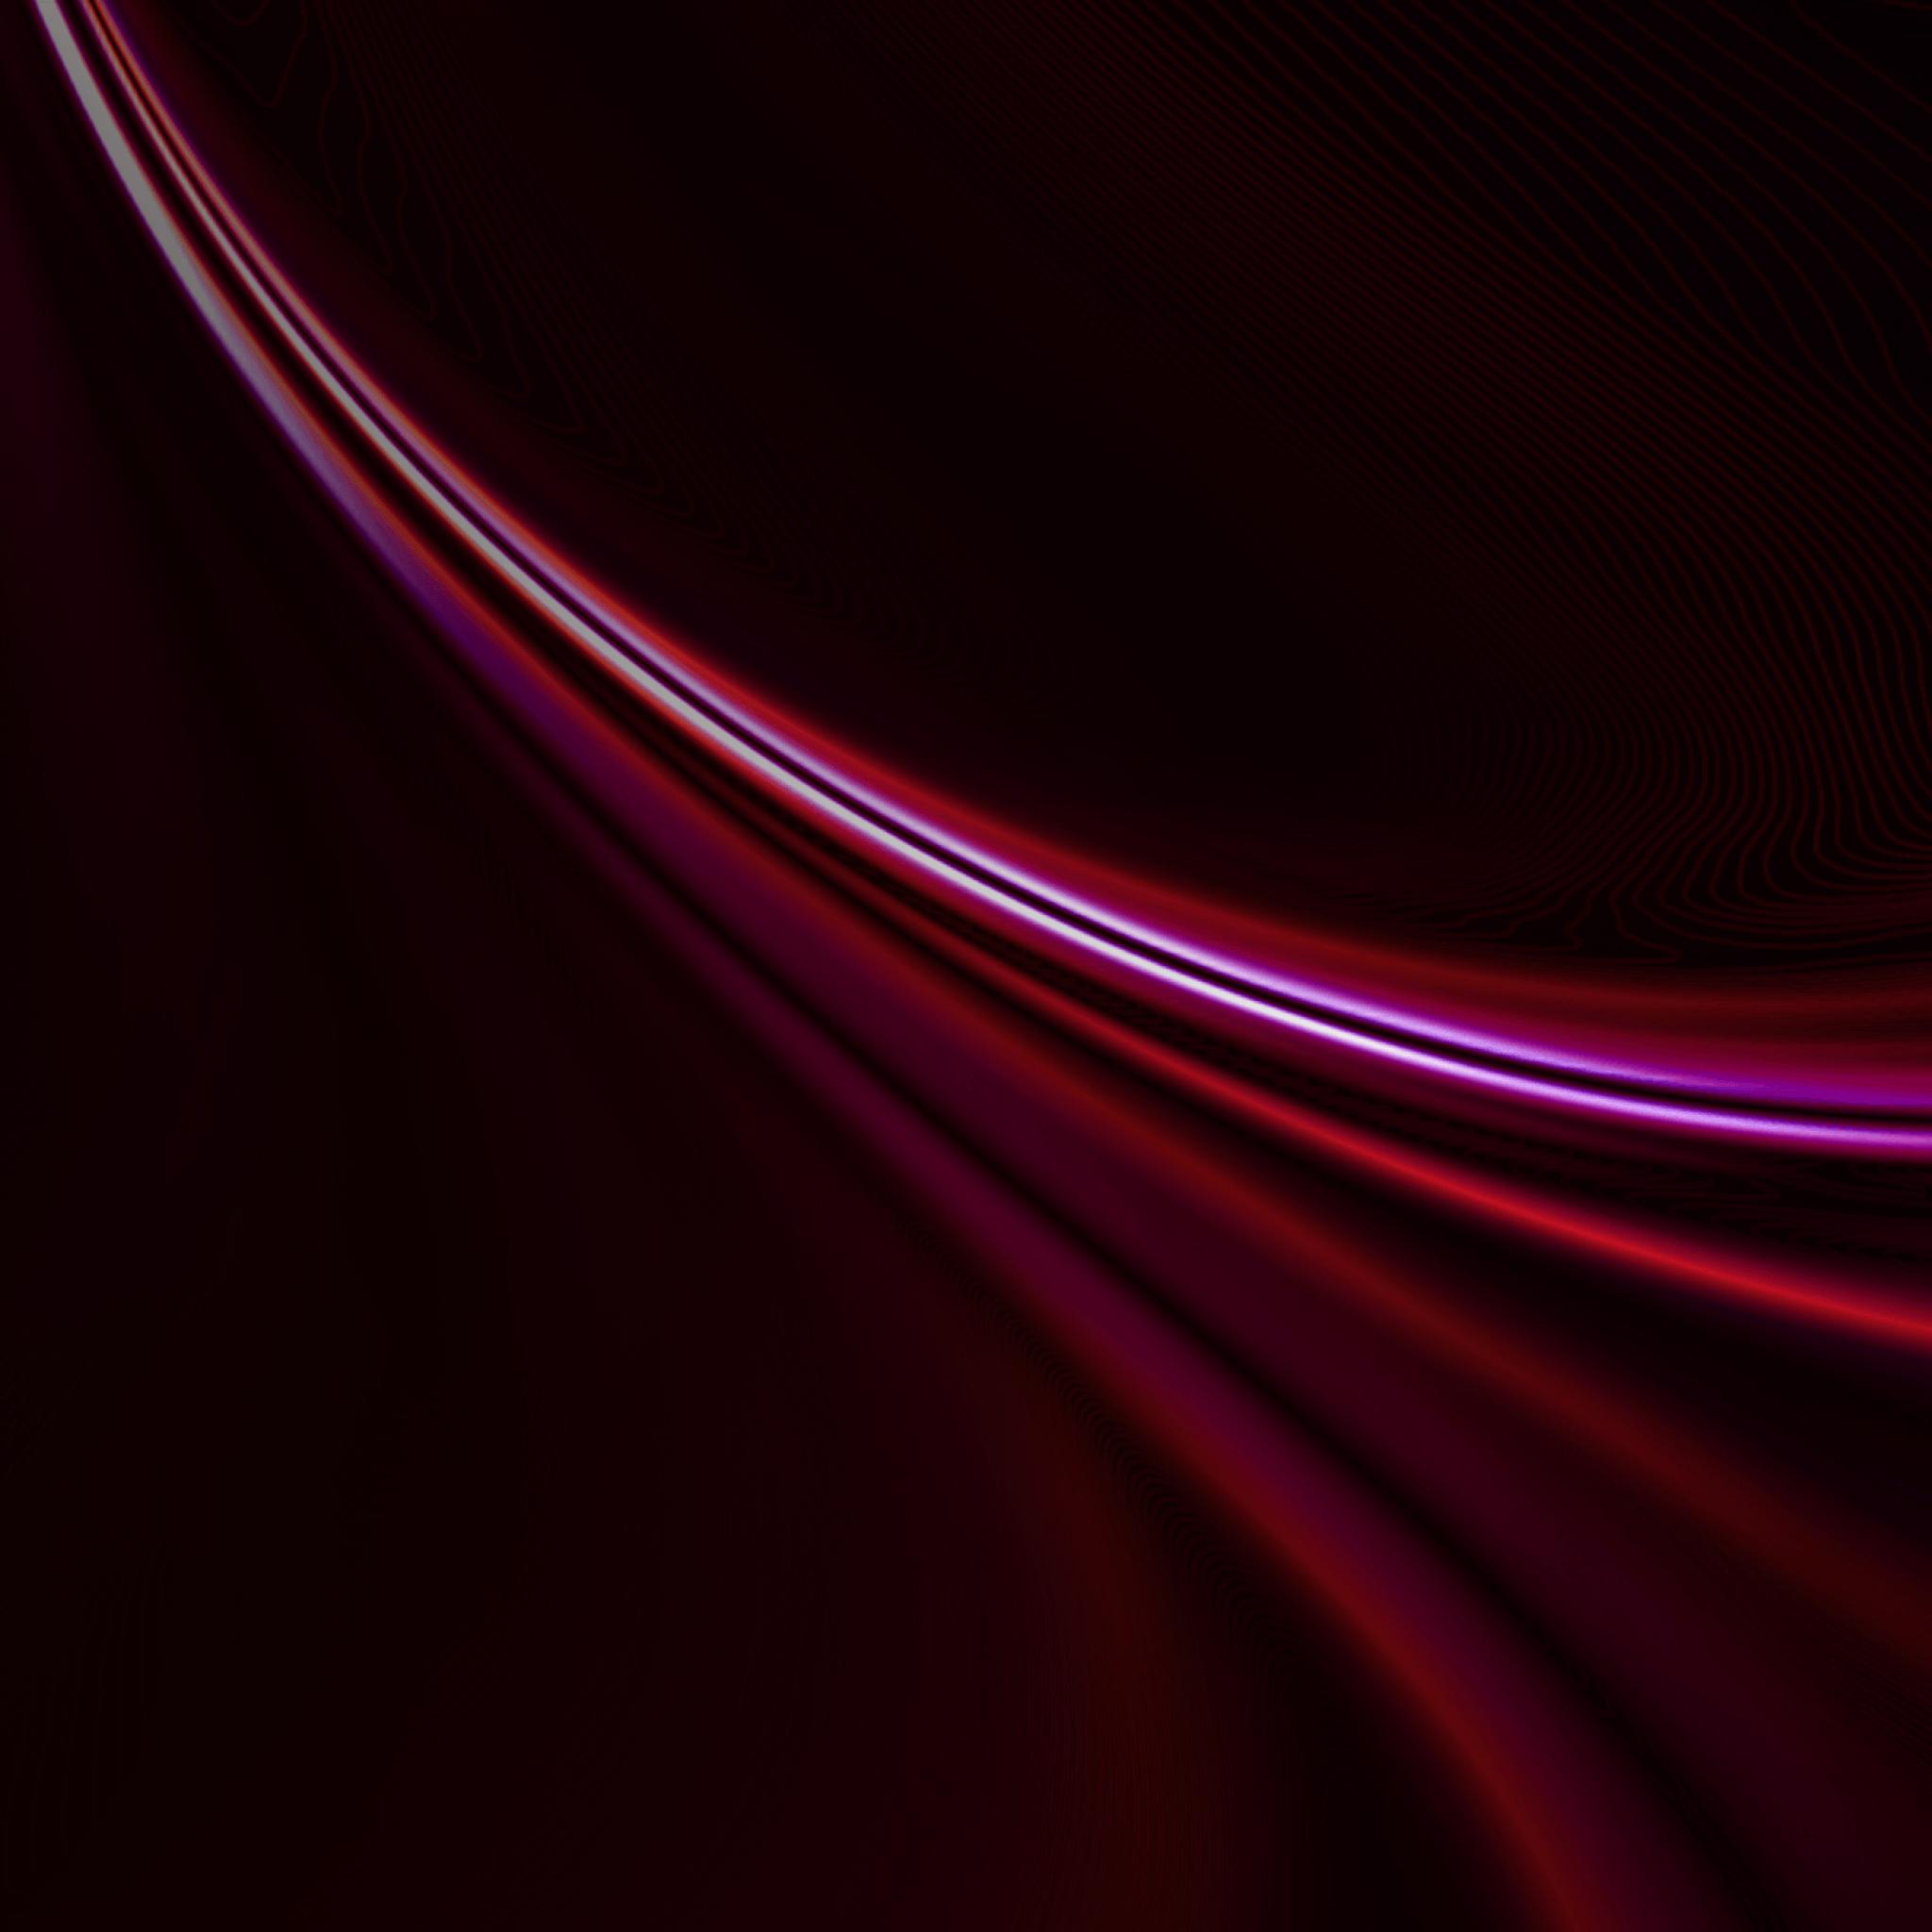 OnePlus 8 Pro 4K Wallpaper, Stock, Red, QHD, 2020